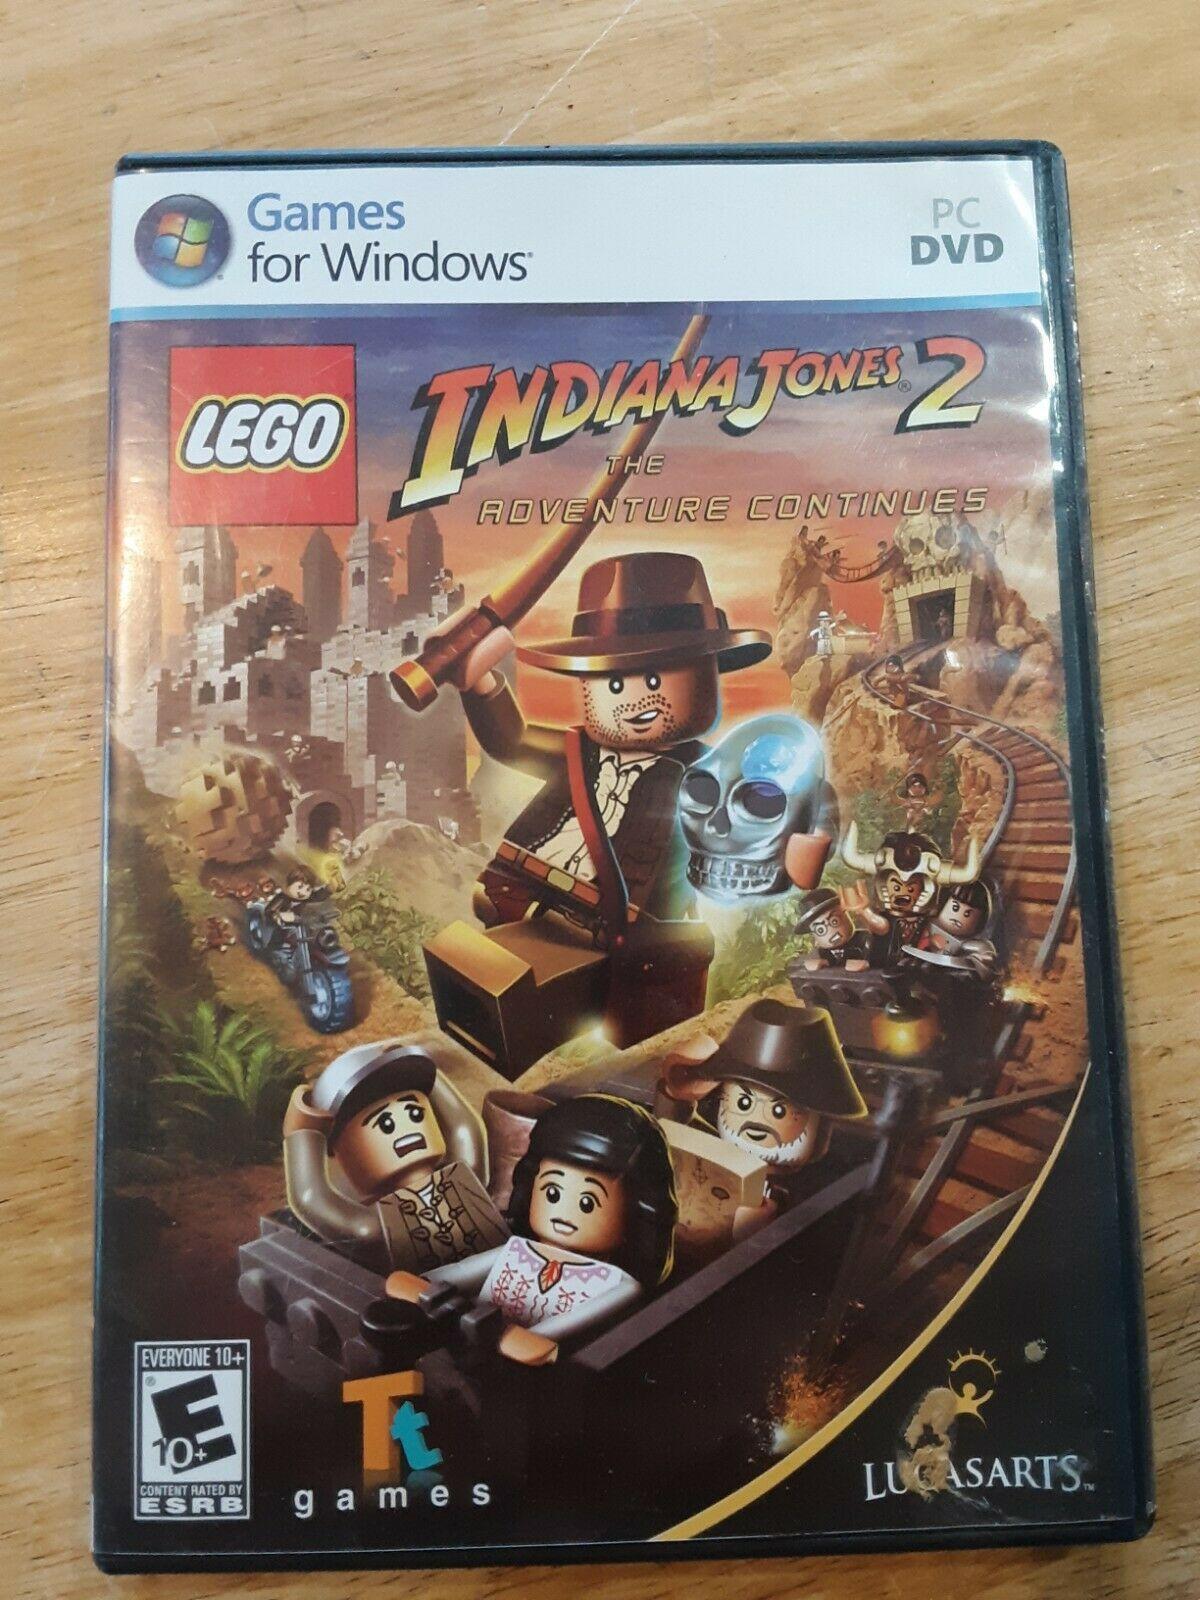 LEGO Indiana Jones 2: The Adventure Continues (PC, 2009) w Case - $7.91